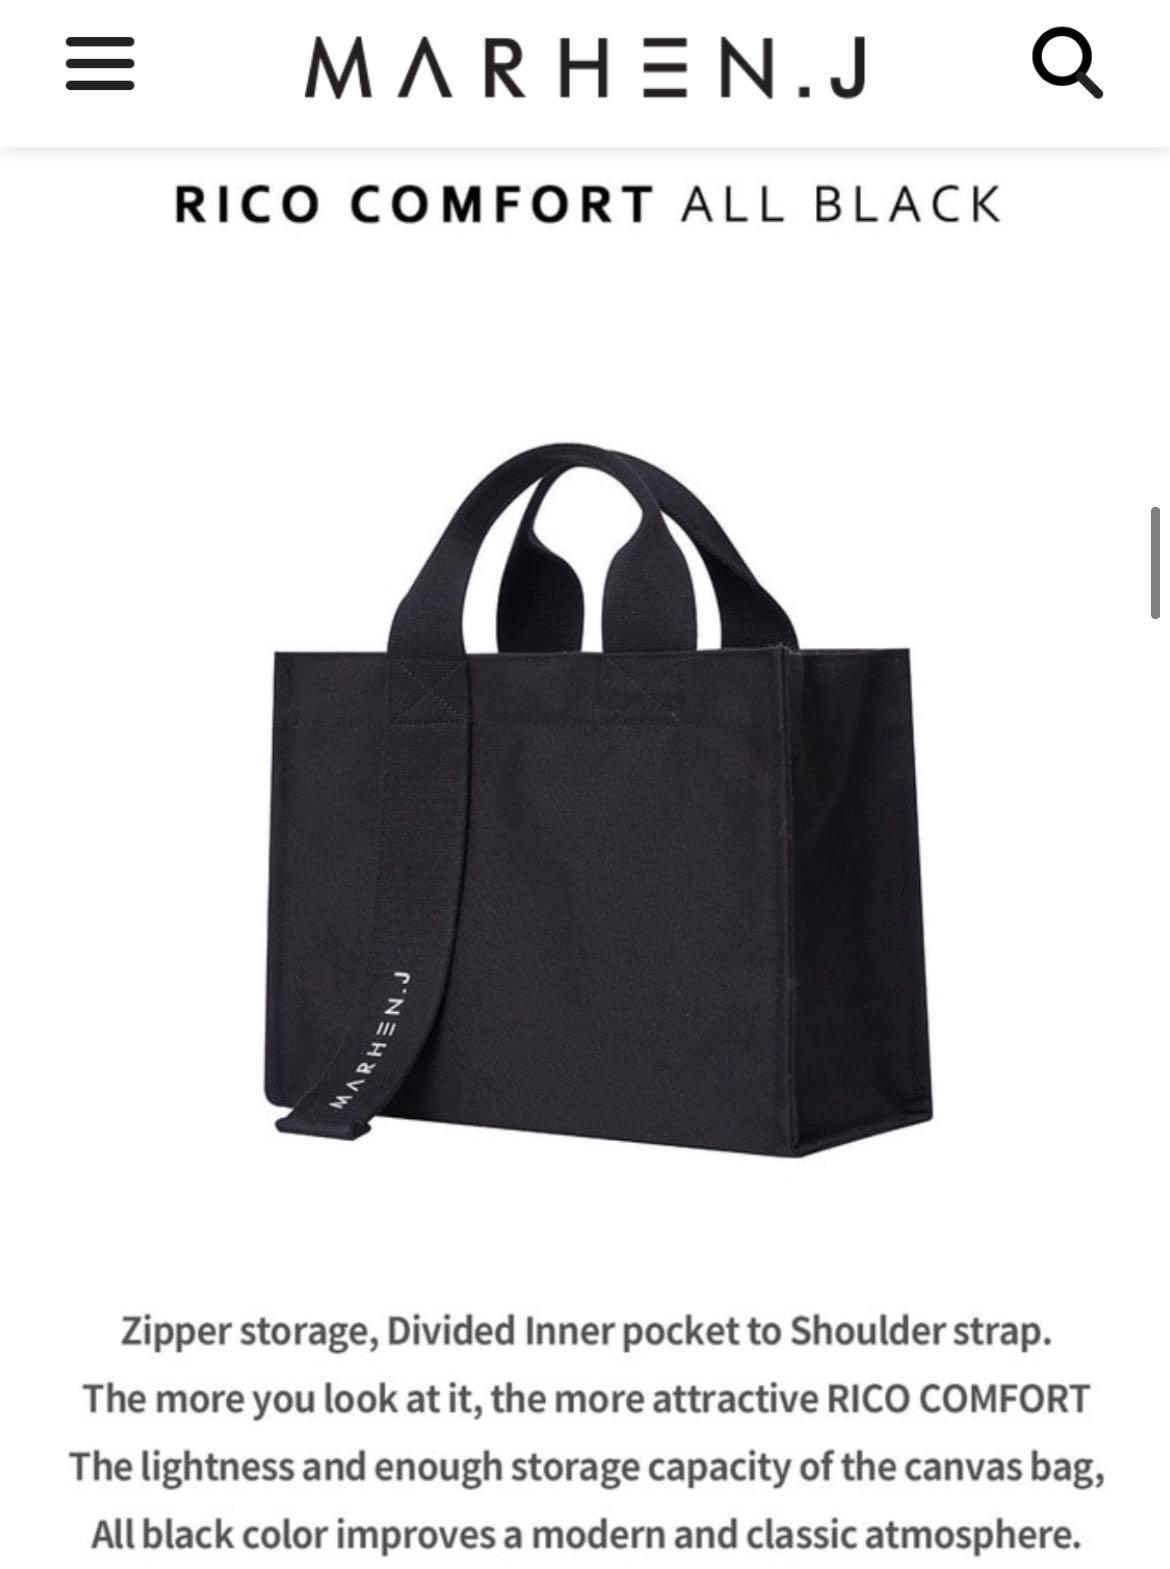 Vegan leather canvas tote bag